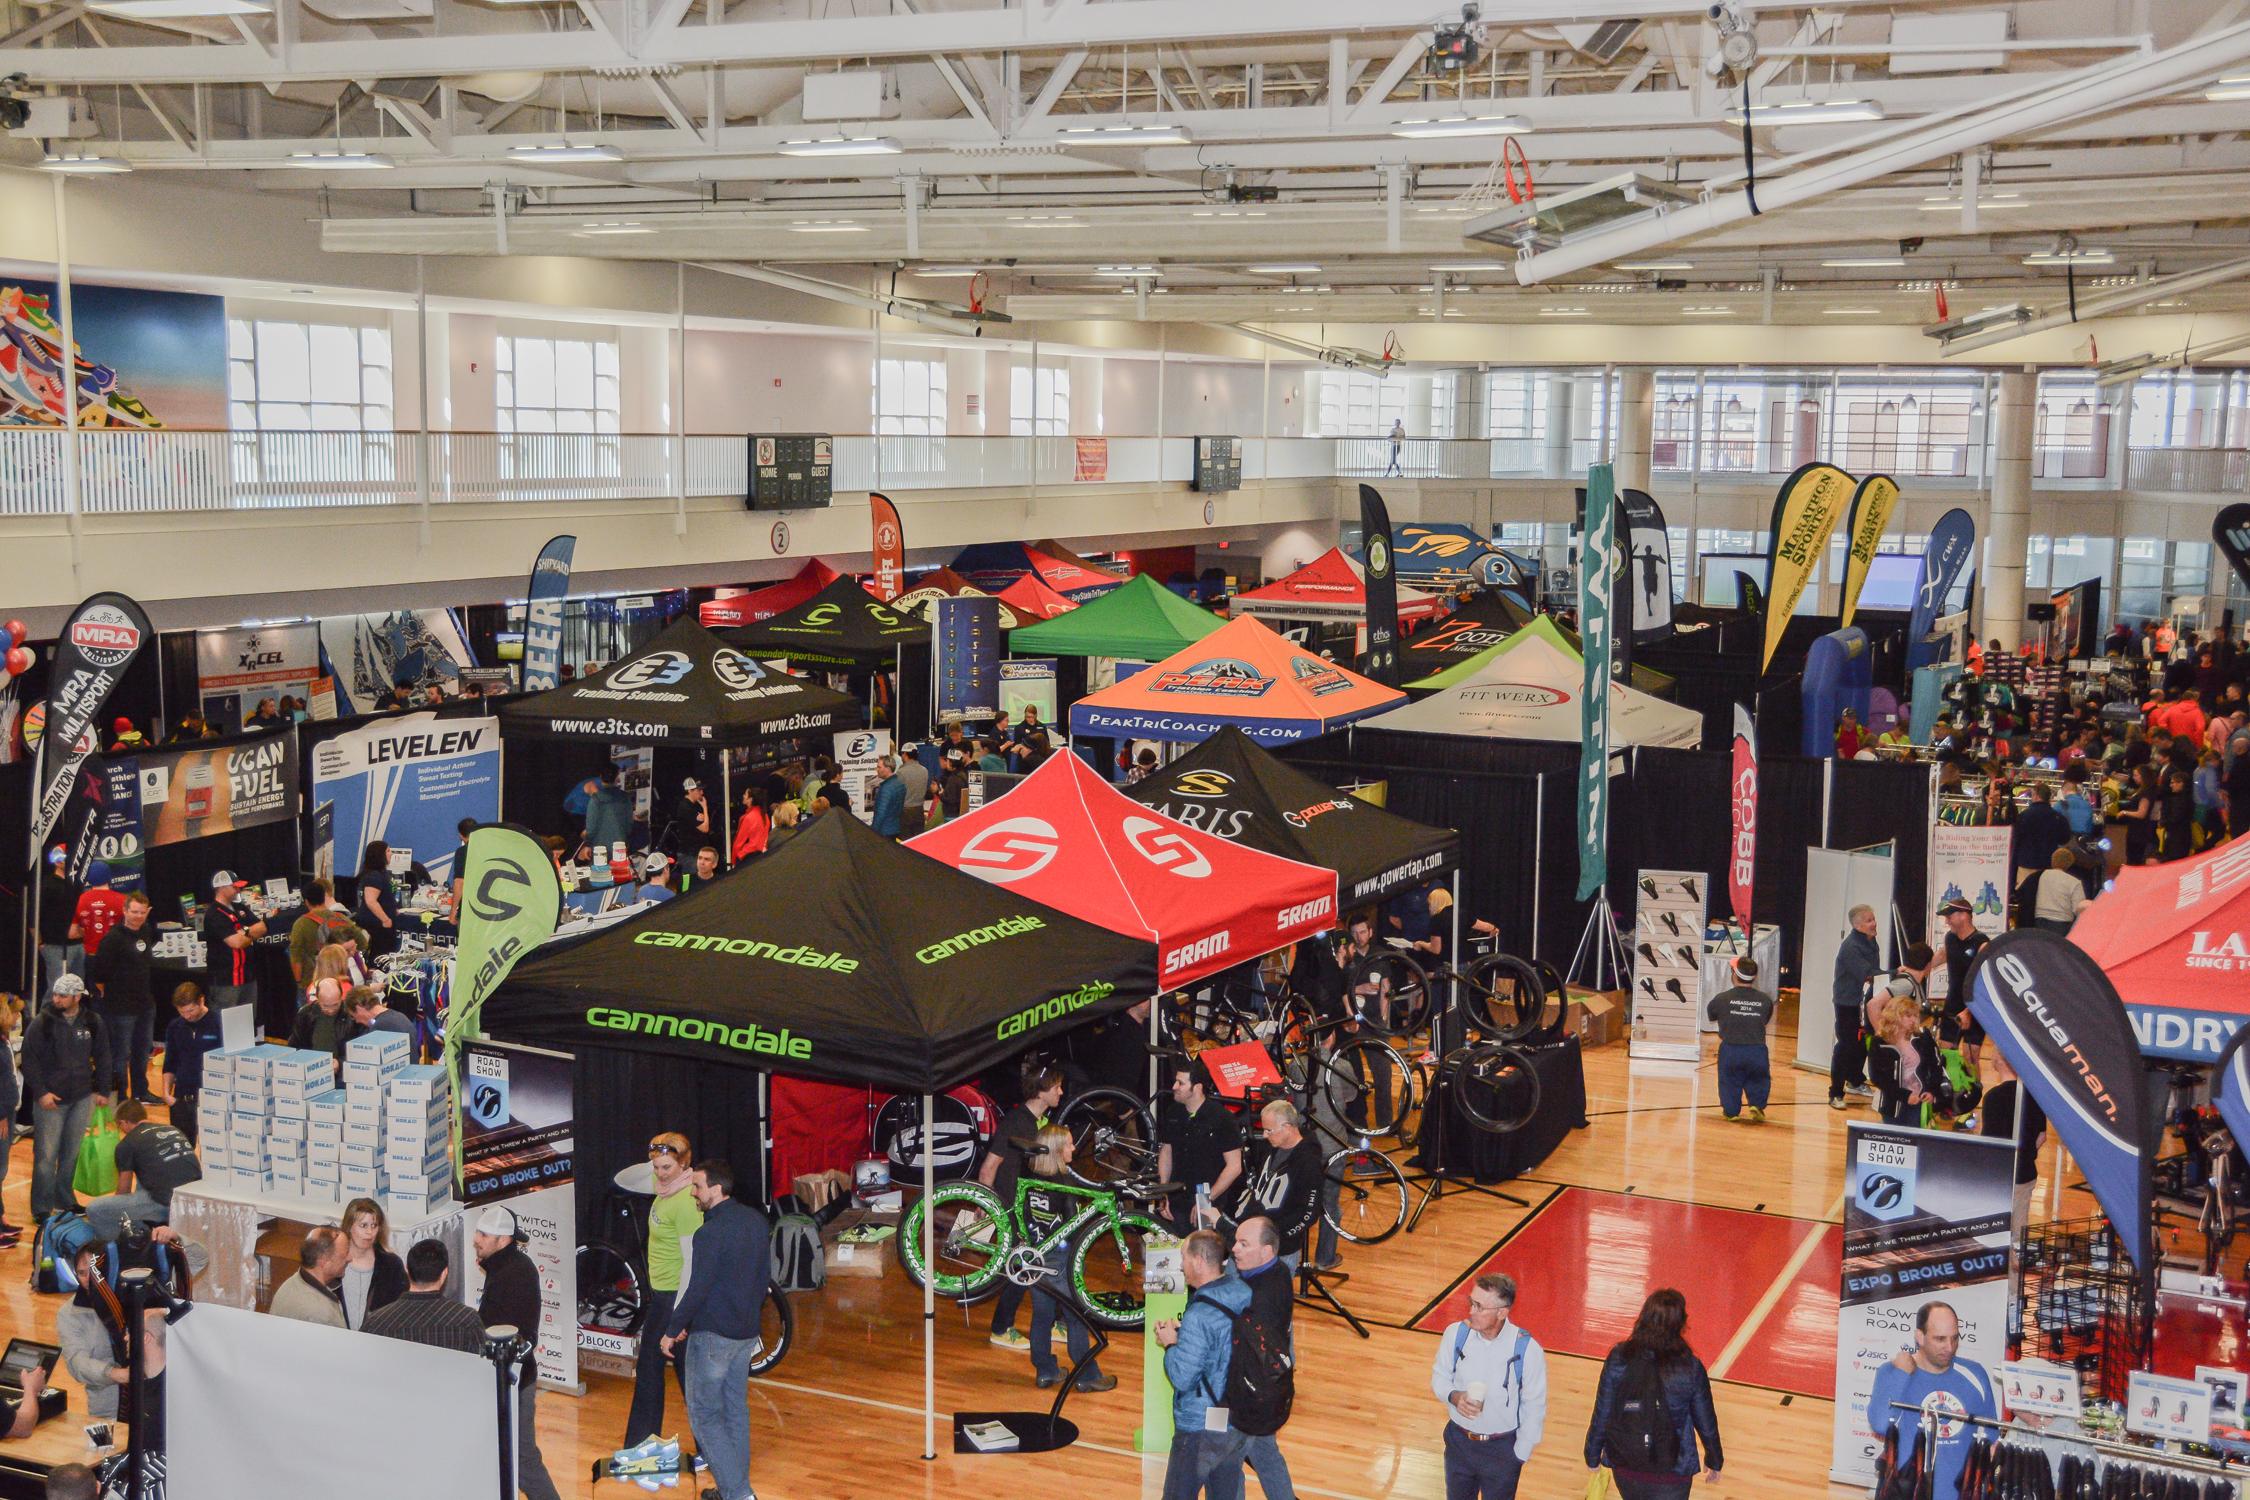 2016 Race-Mania Expo in Boston